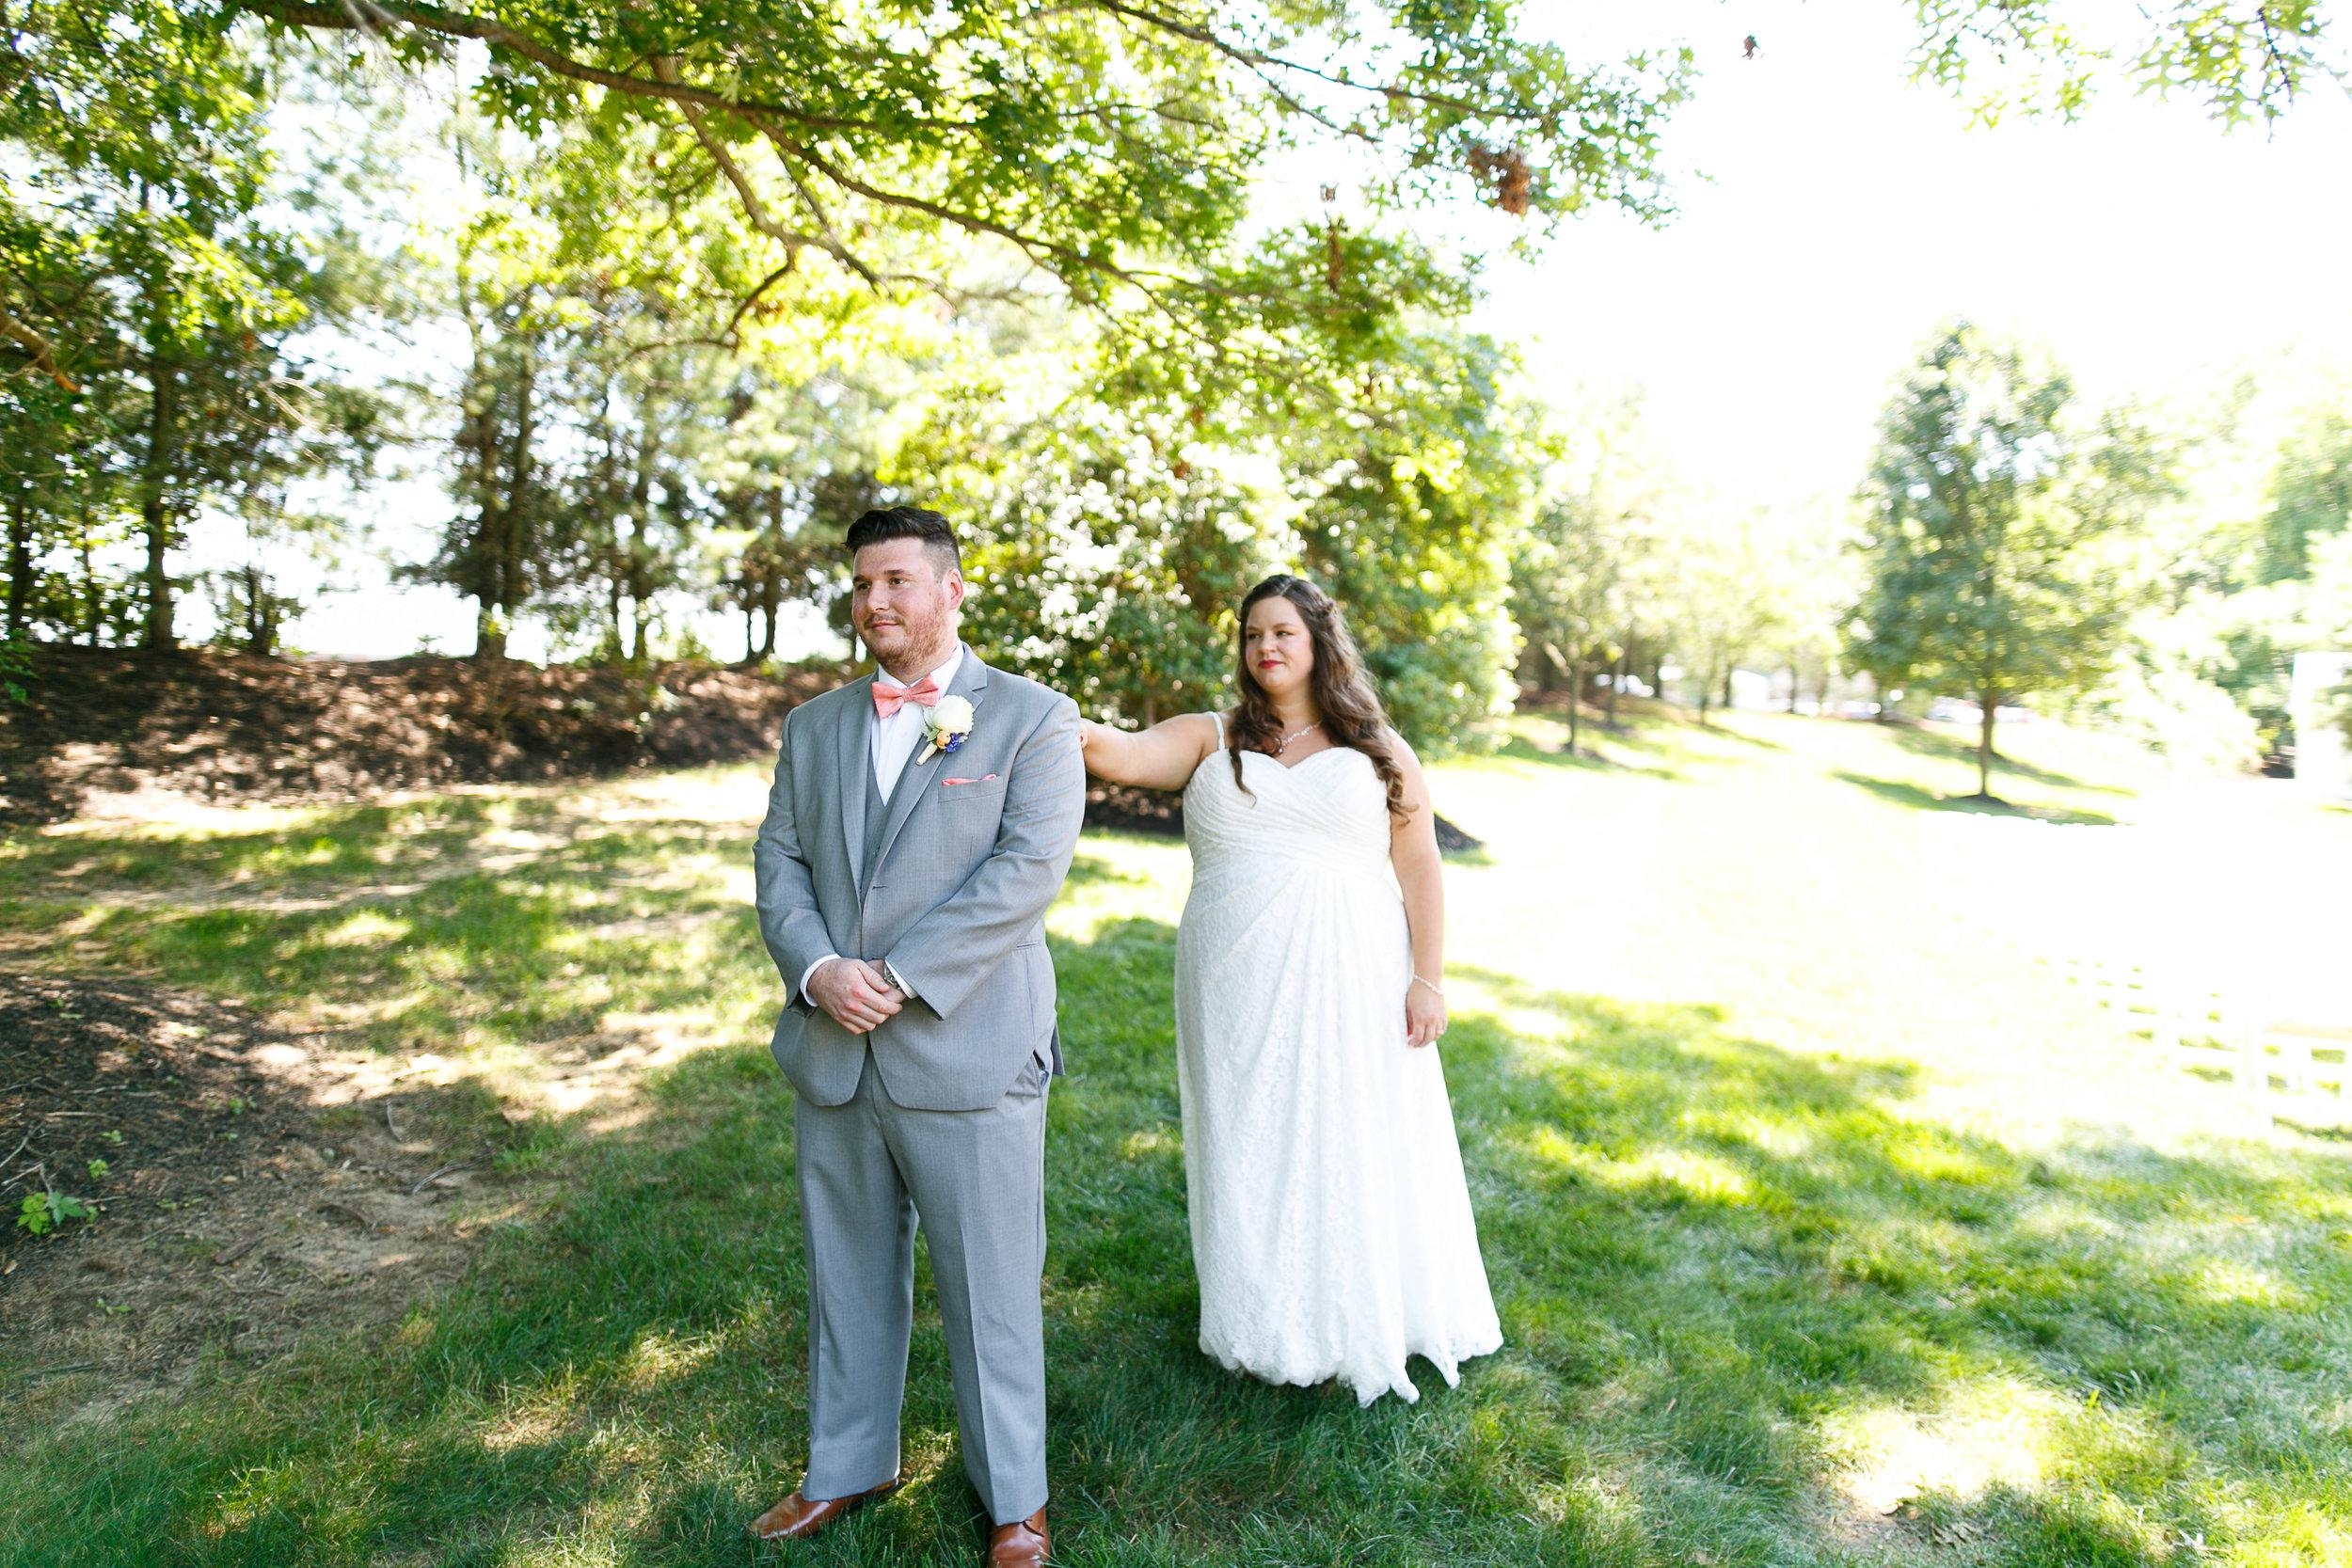 Kait and Tim Wedding Edits-224.jpg